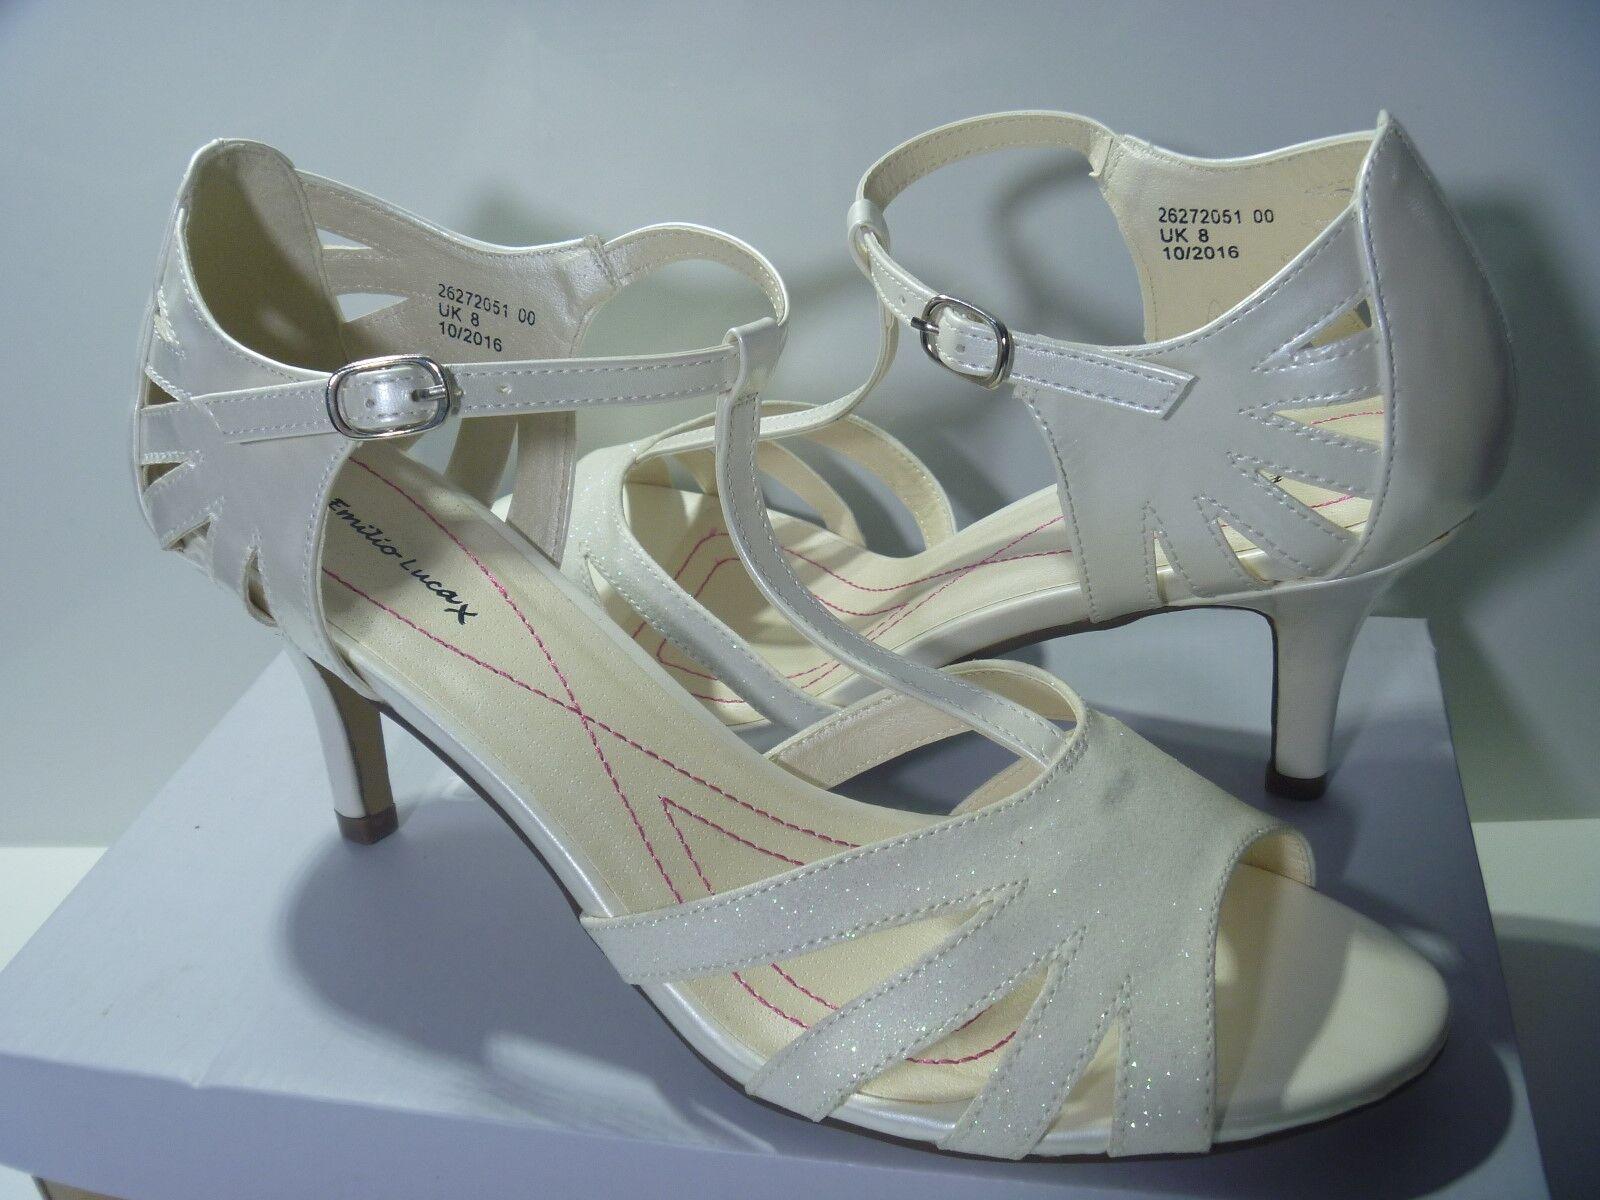 EMILIO LUCA LADIES CHACHA SHOES WHITE METALLIC GLITTER SANDALS WEDDING RACES 6